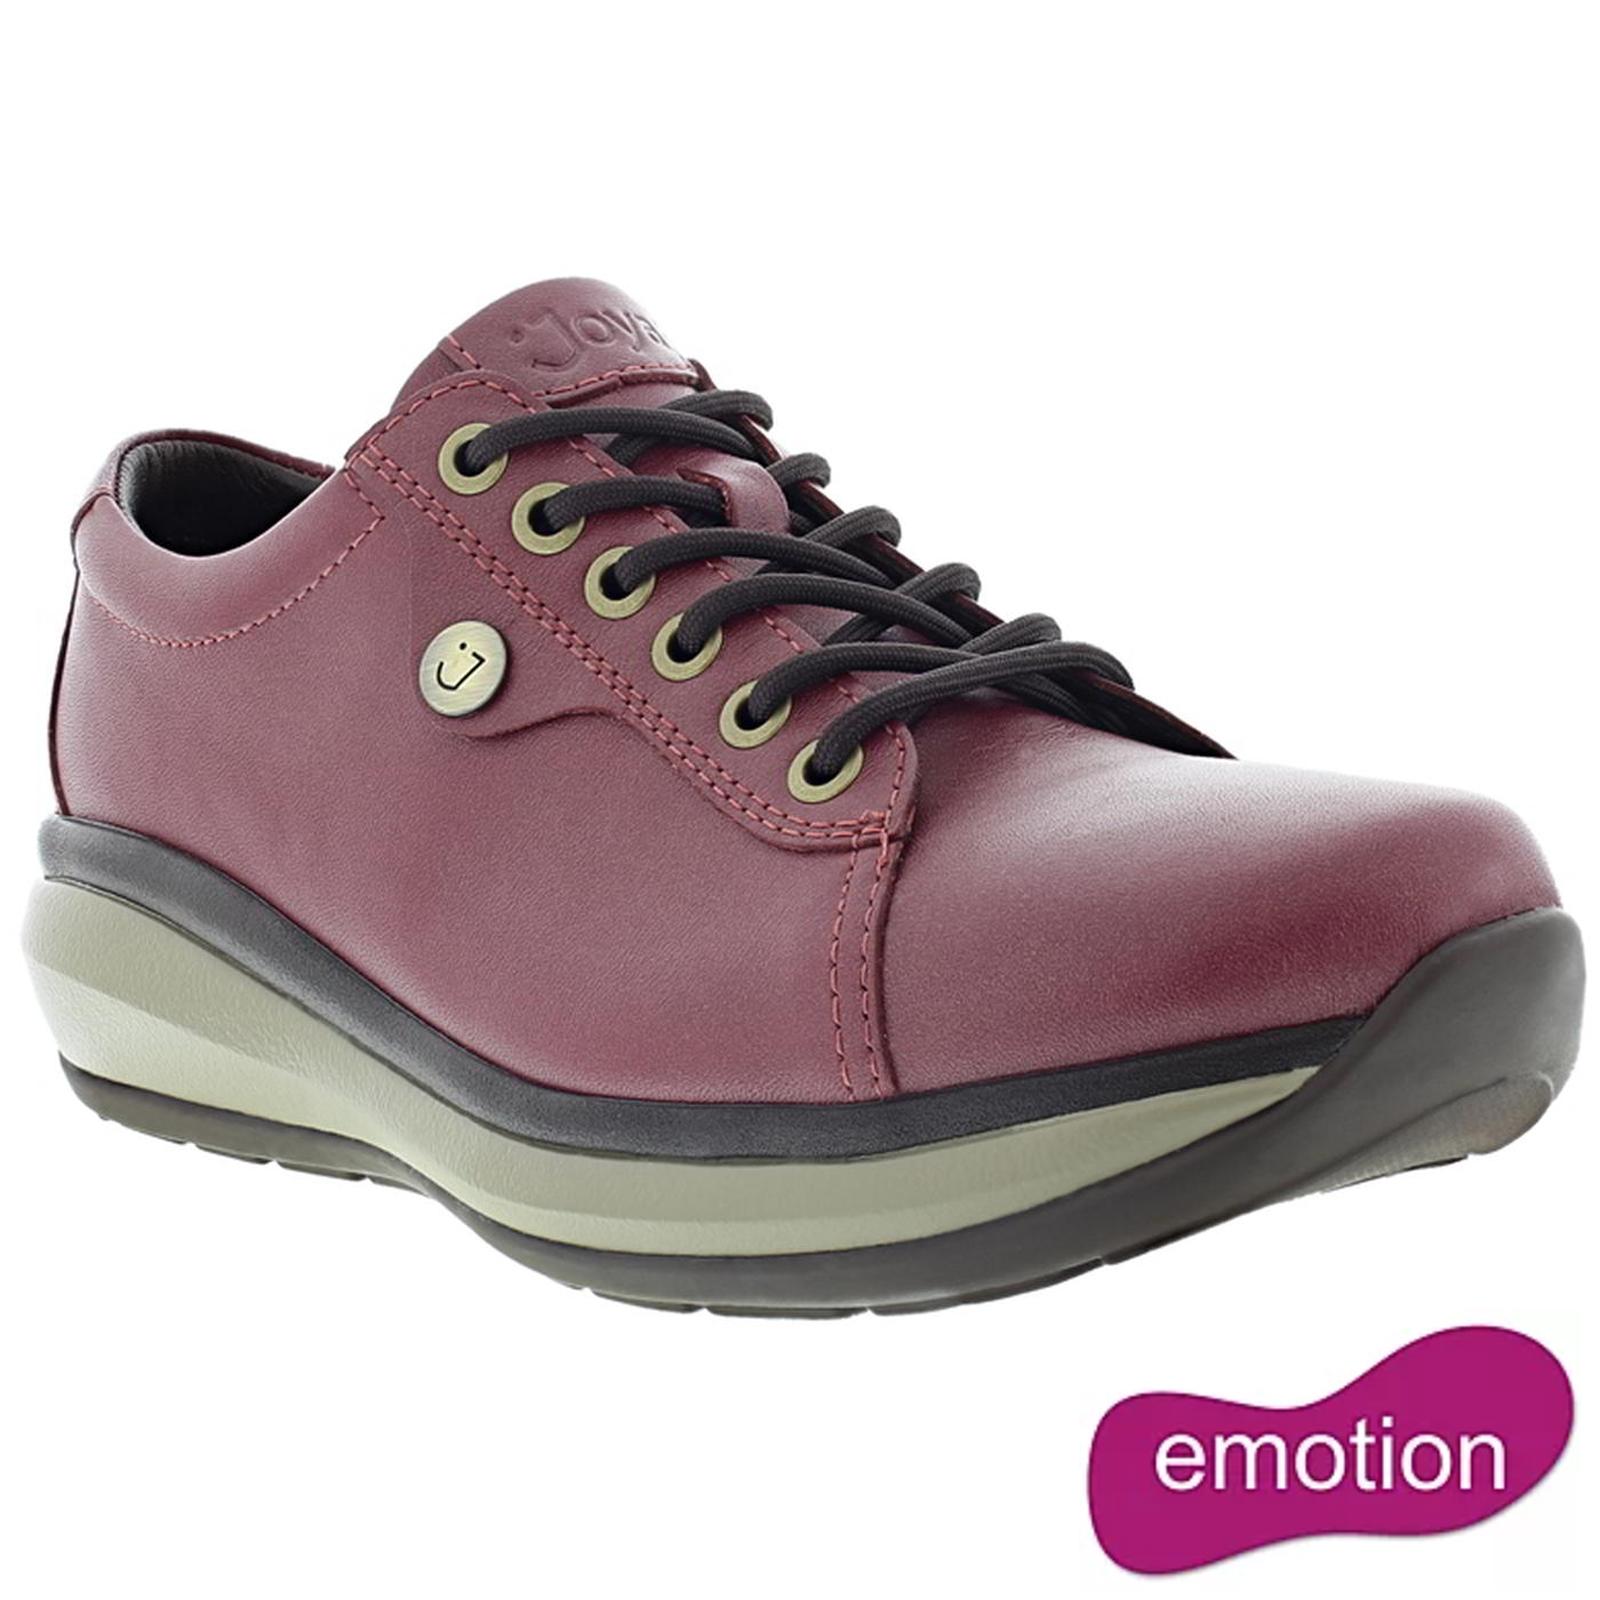 Joya Womens Paris II Leather Shoes - Burgandy